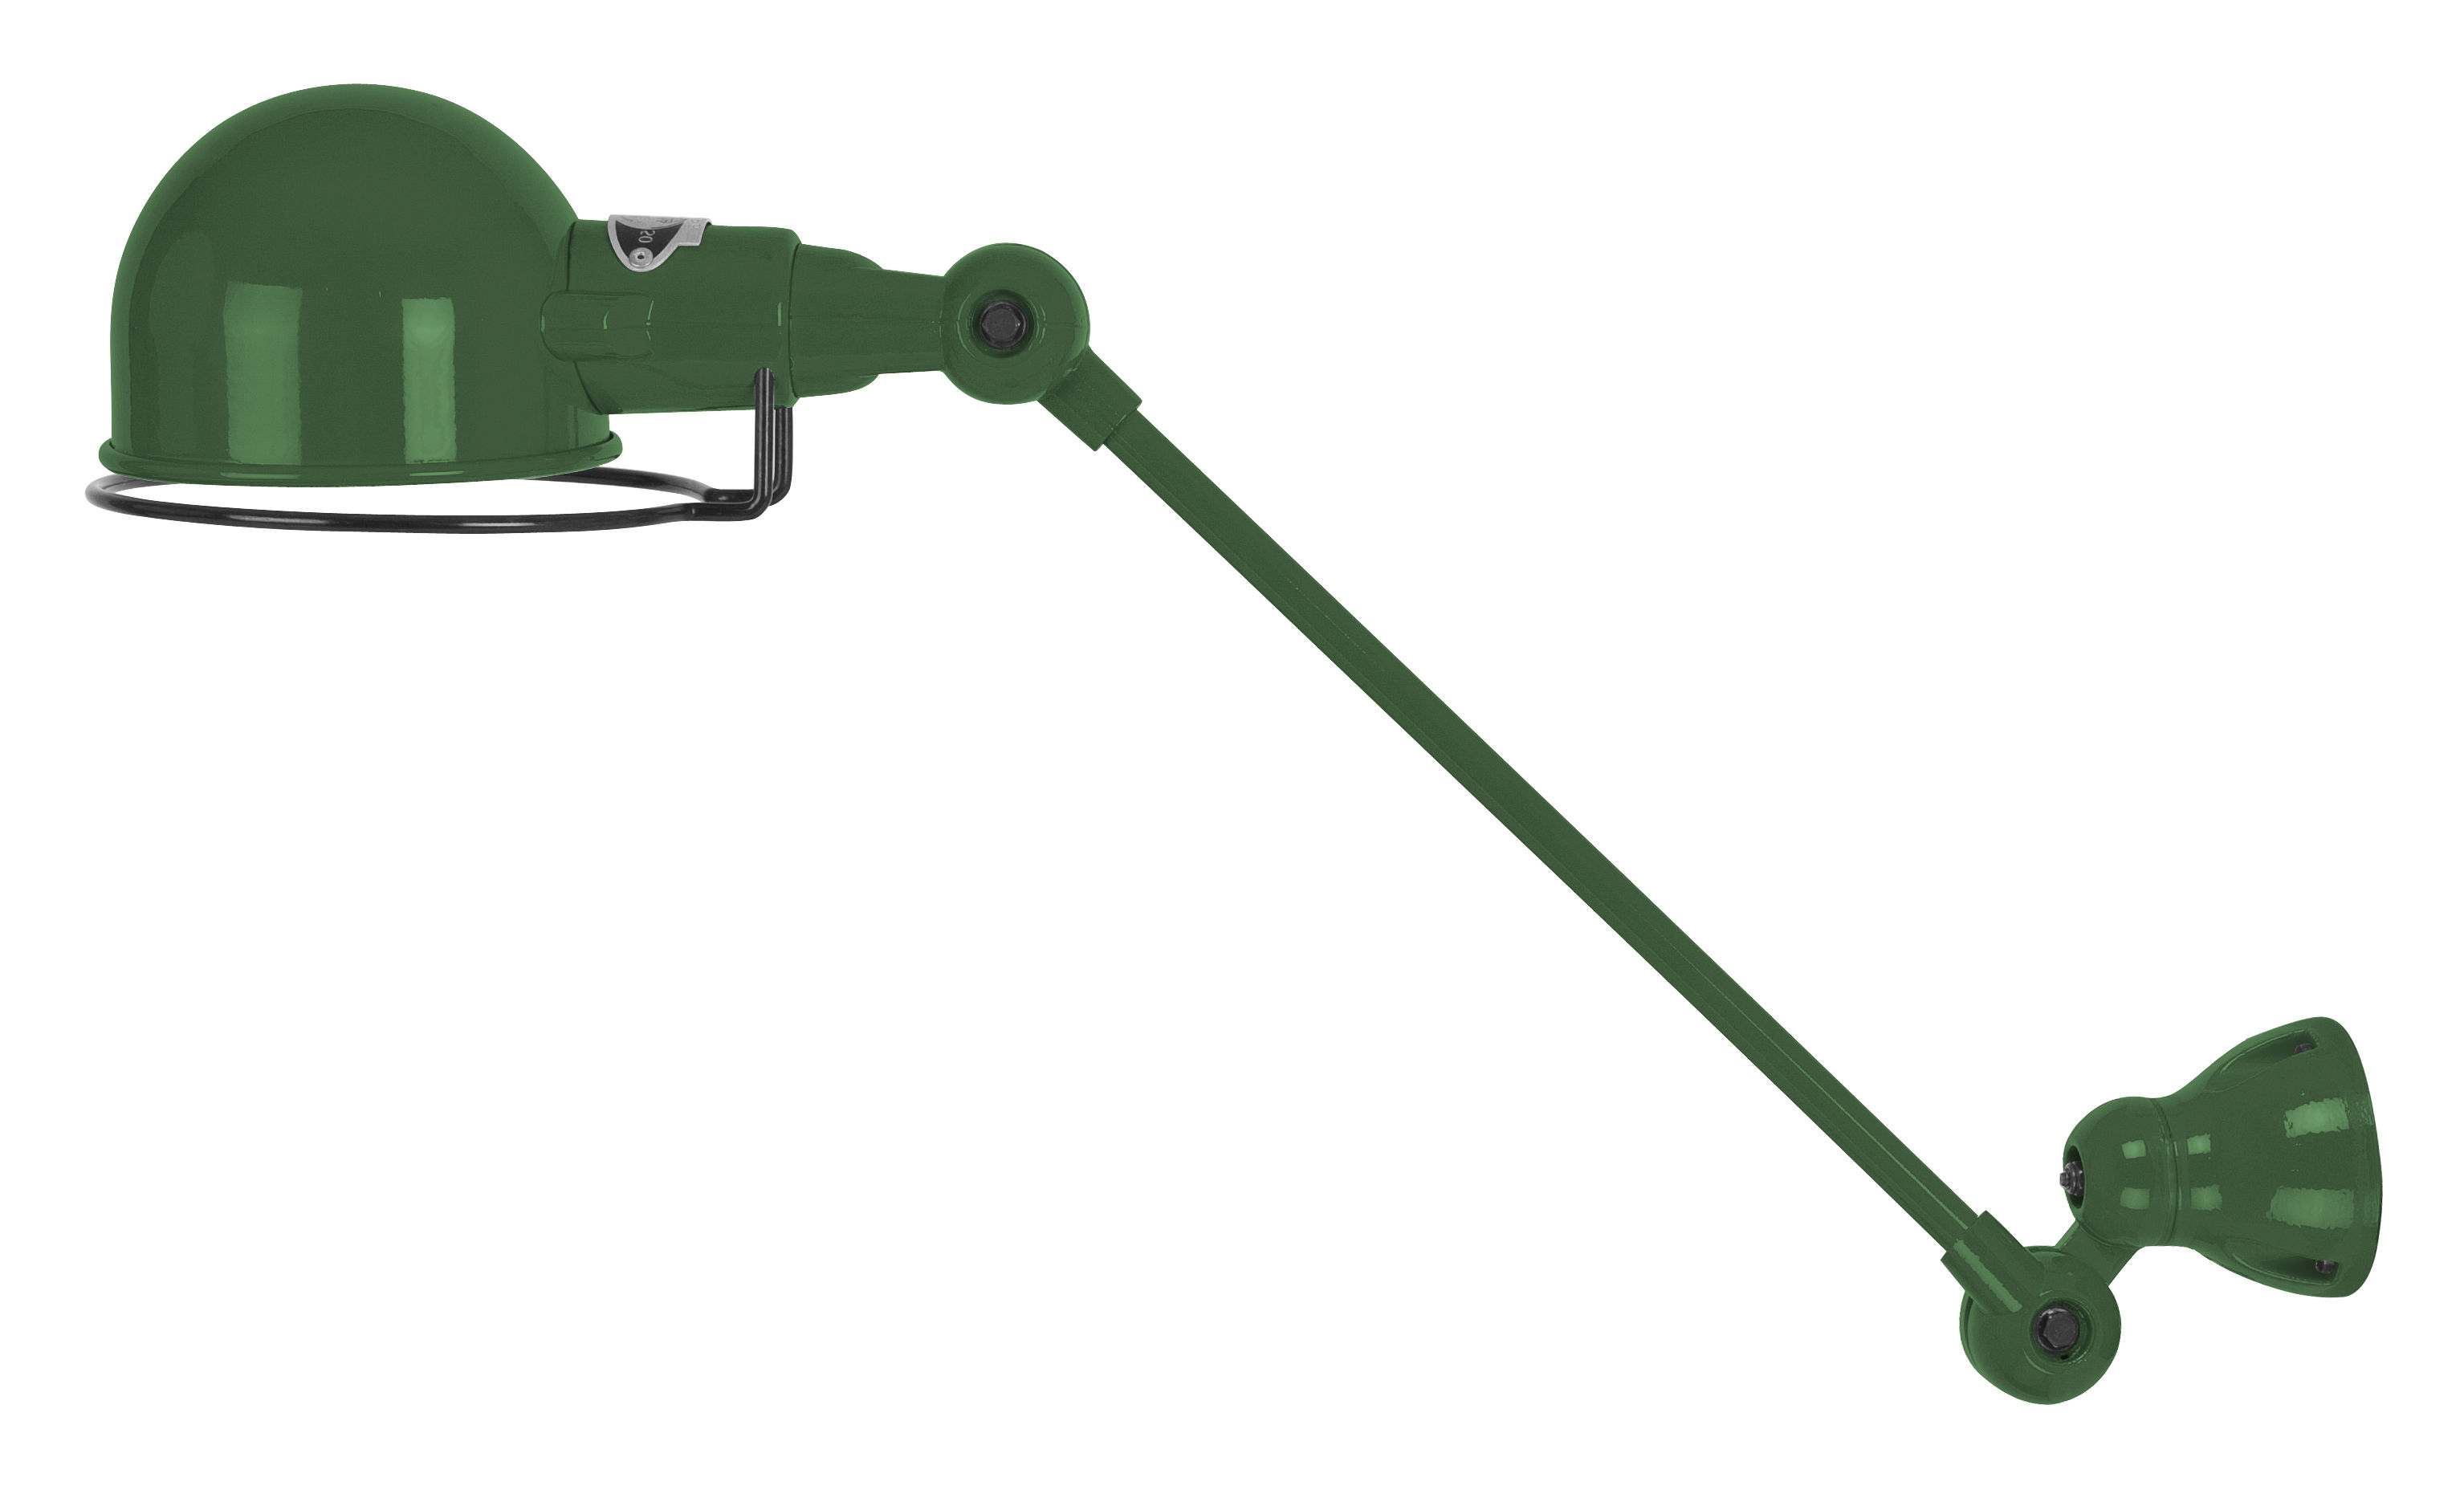 Signal mit gelenkarm l 30 cm jield wandleuchte - Schwenkbare wandleuchte mit gelenkarm ...